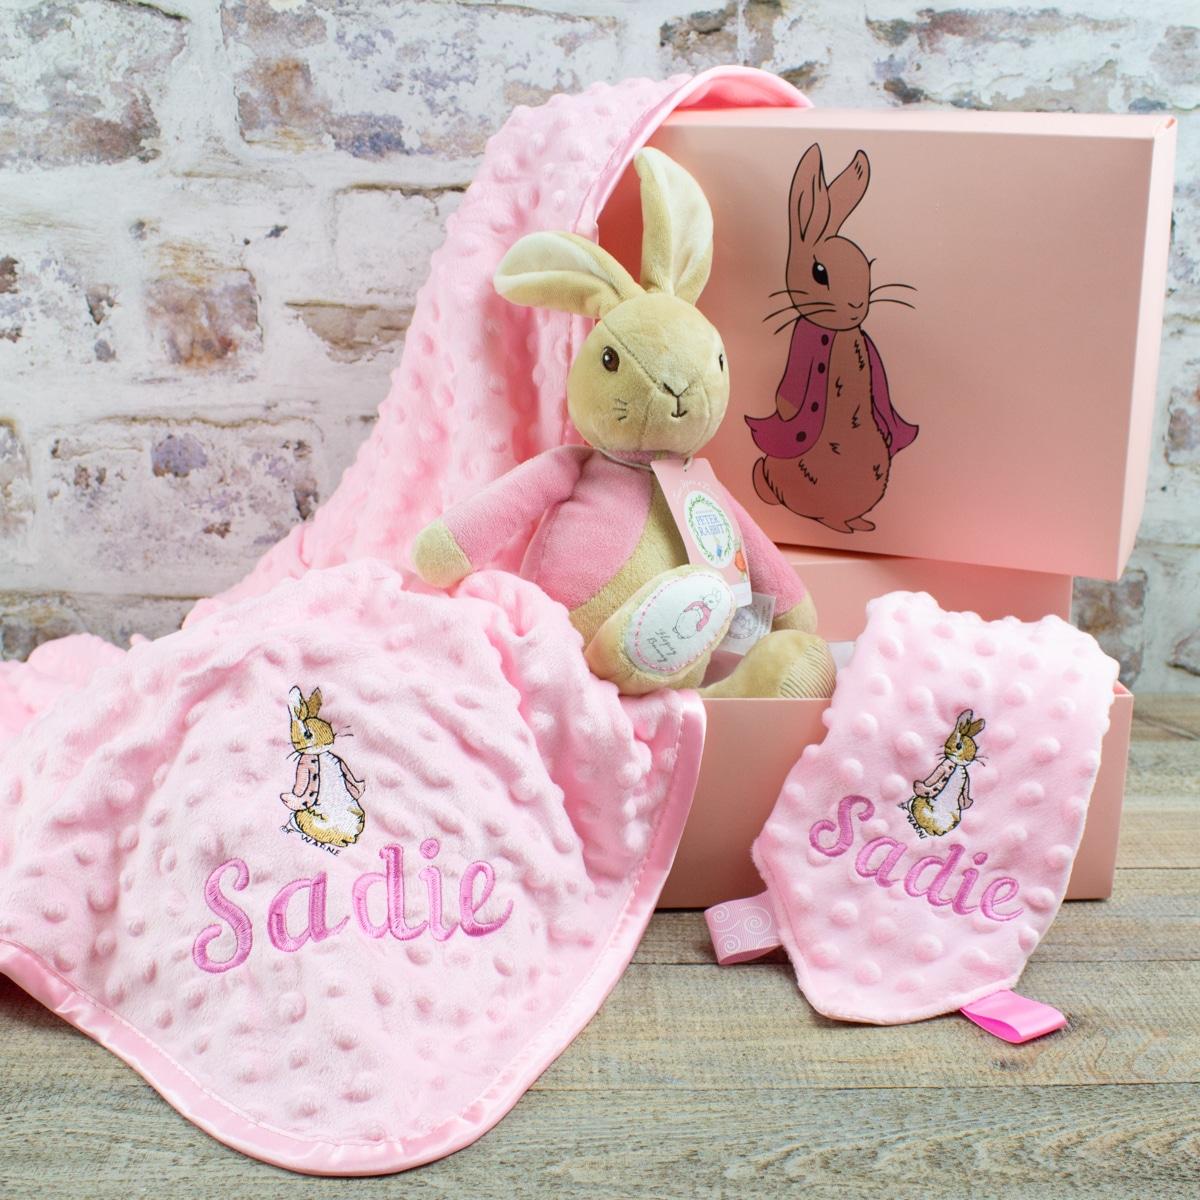 Personalised Baby Girl Peter Rabbit Gift Hamper